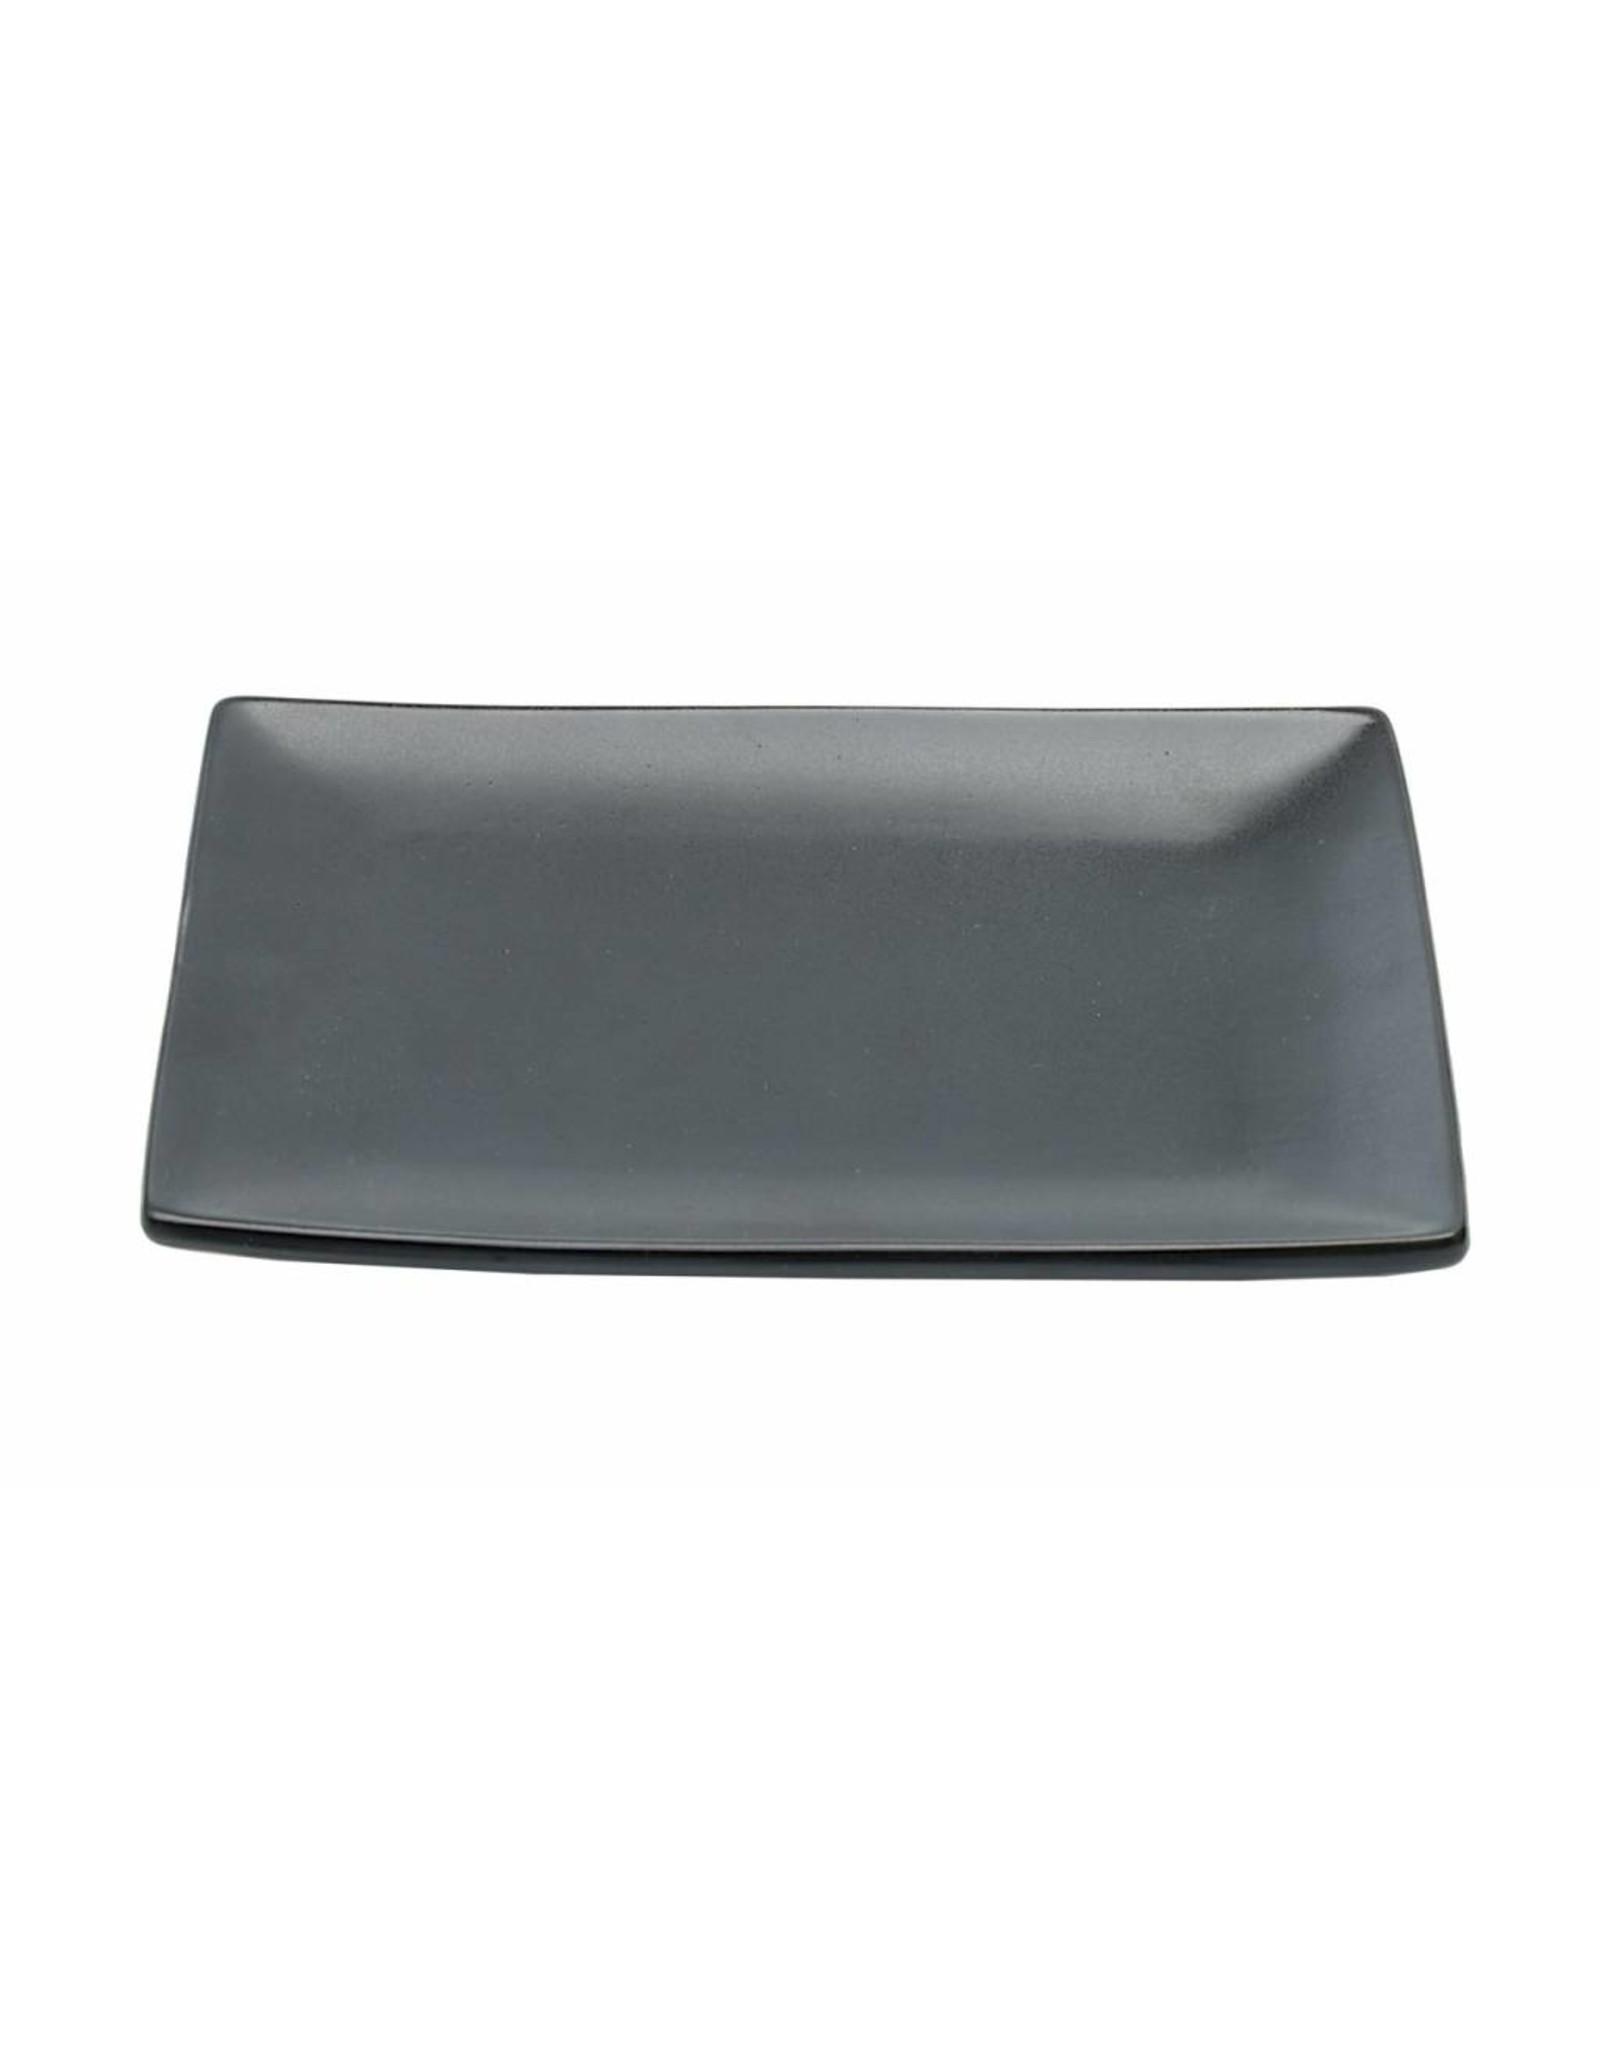 Tokyo Design Studio Black Series bord 17.5x12.5cm mat zwart